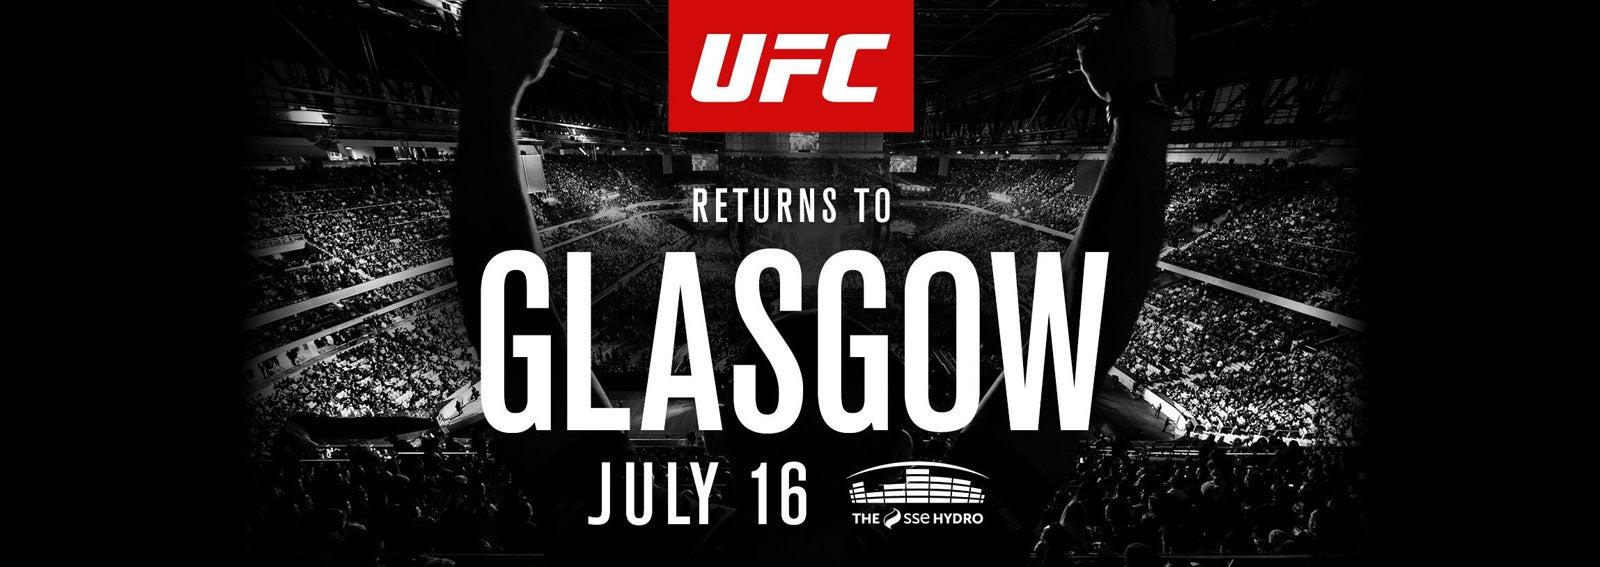 UFC2017_1600x567.jpg